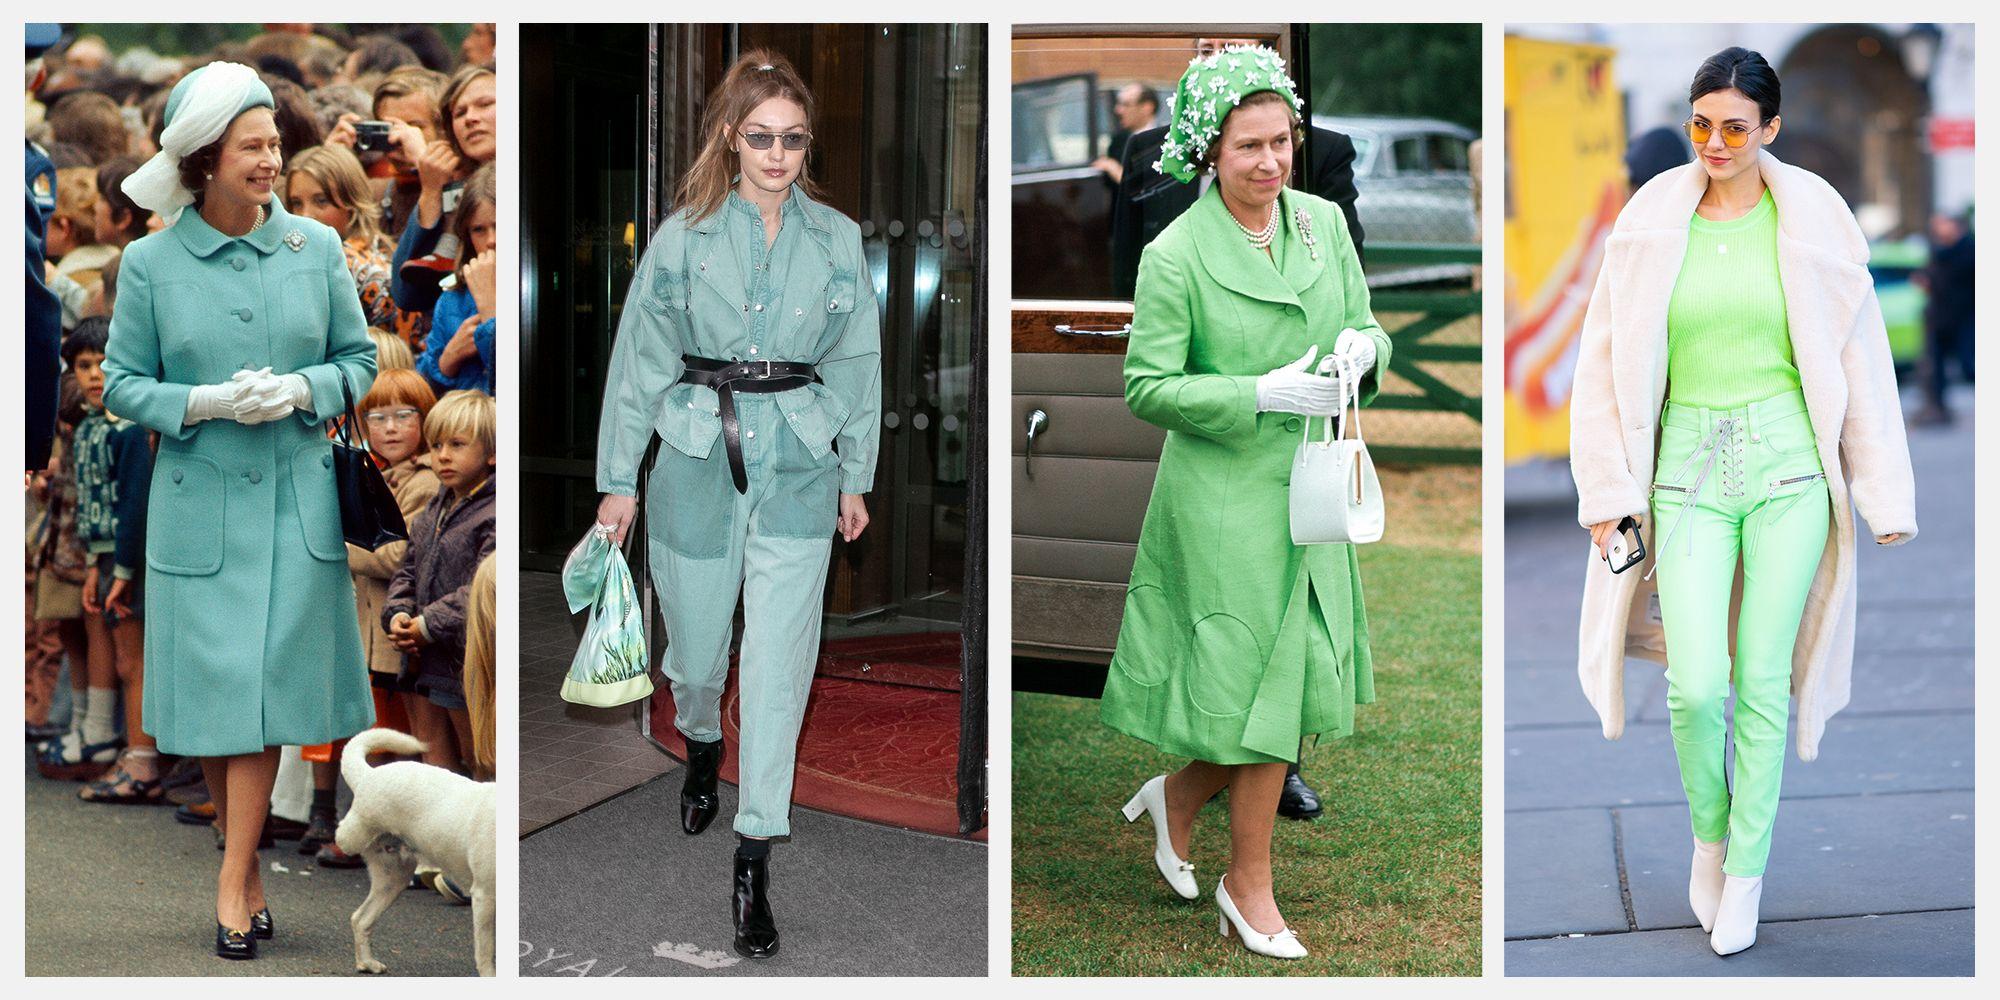 queen elizabeth monochrome outfits